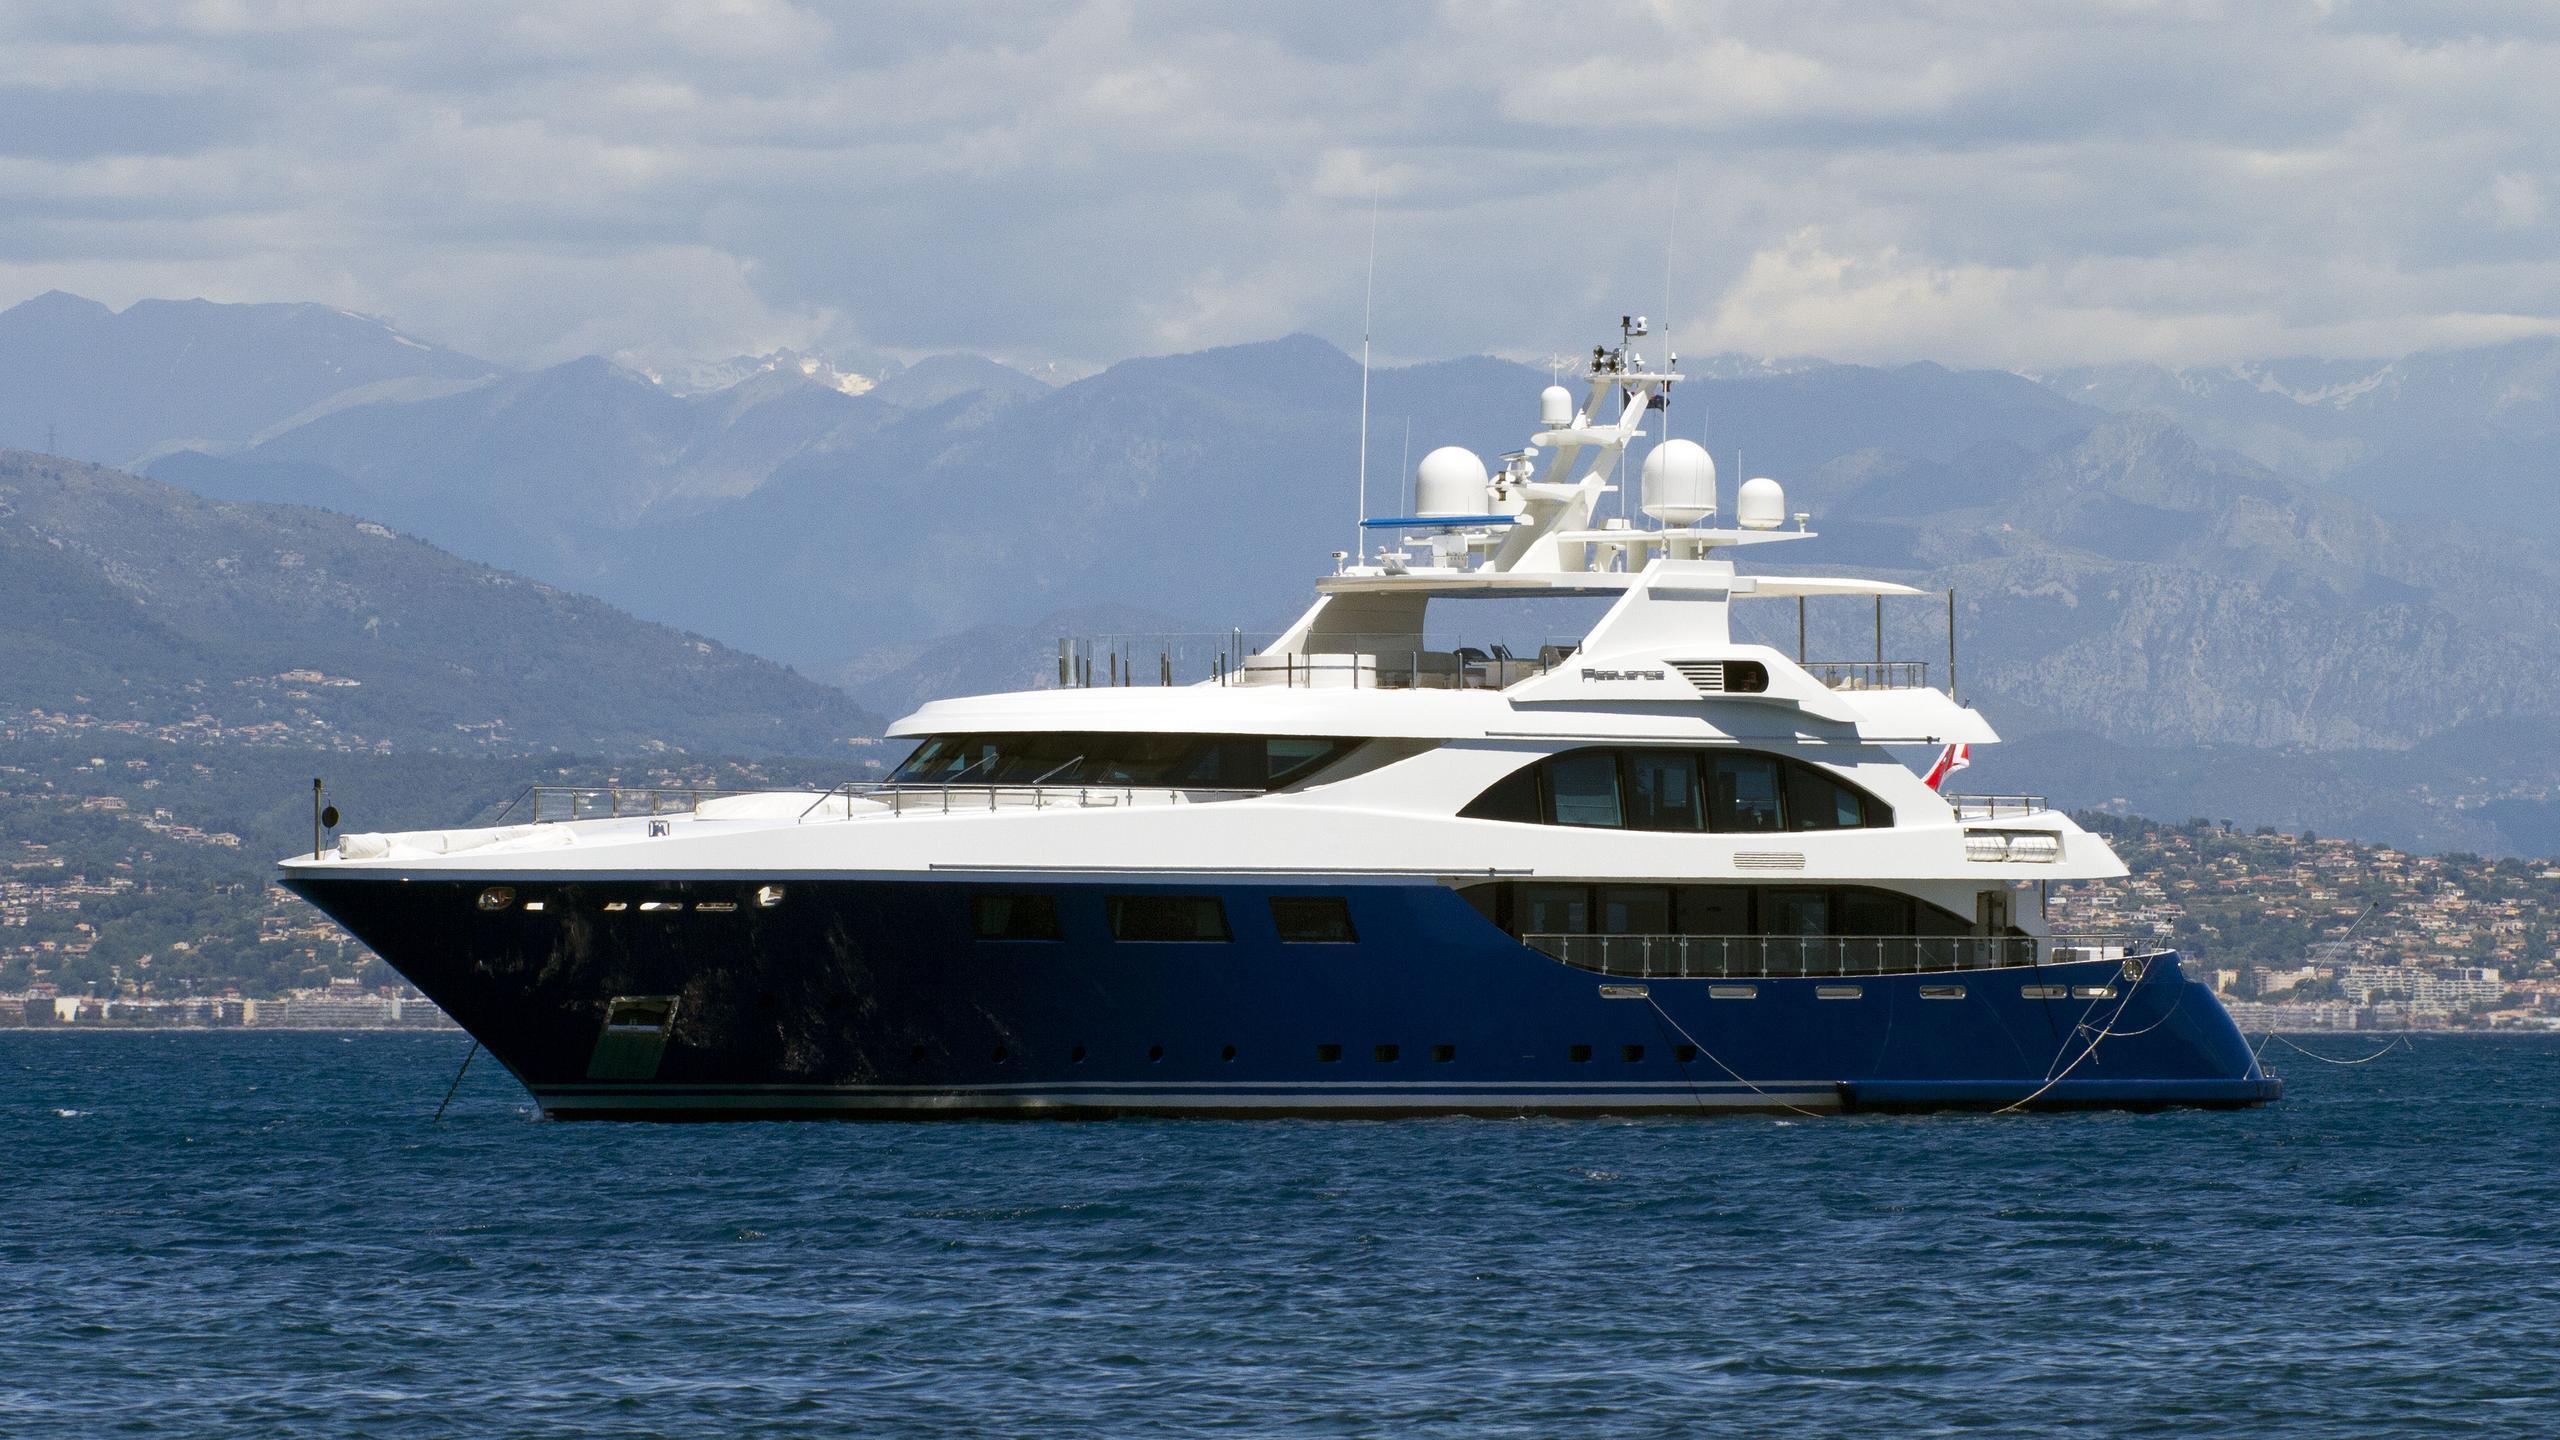 resilience-motor-yacht-ortona-navi-2008-50m-half-profile